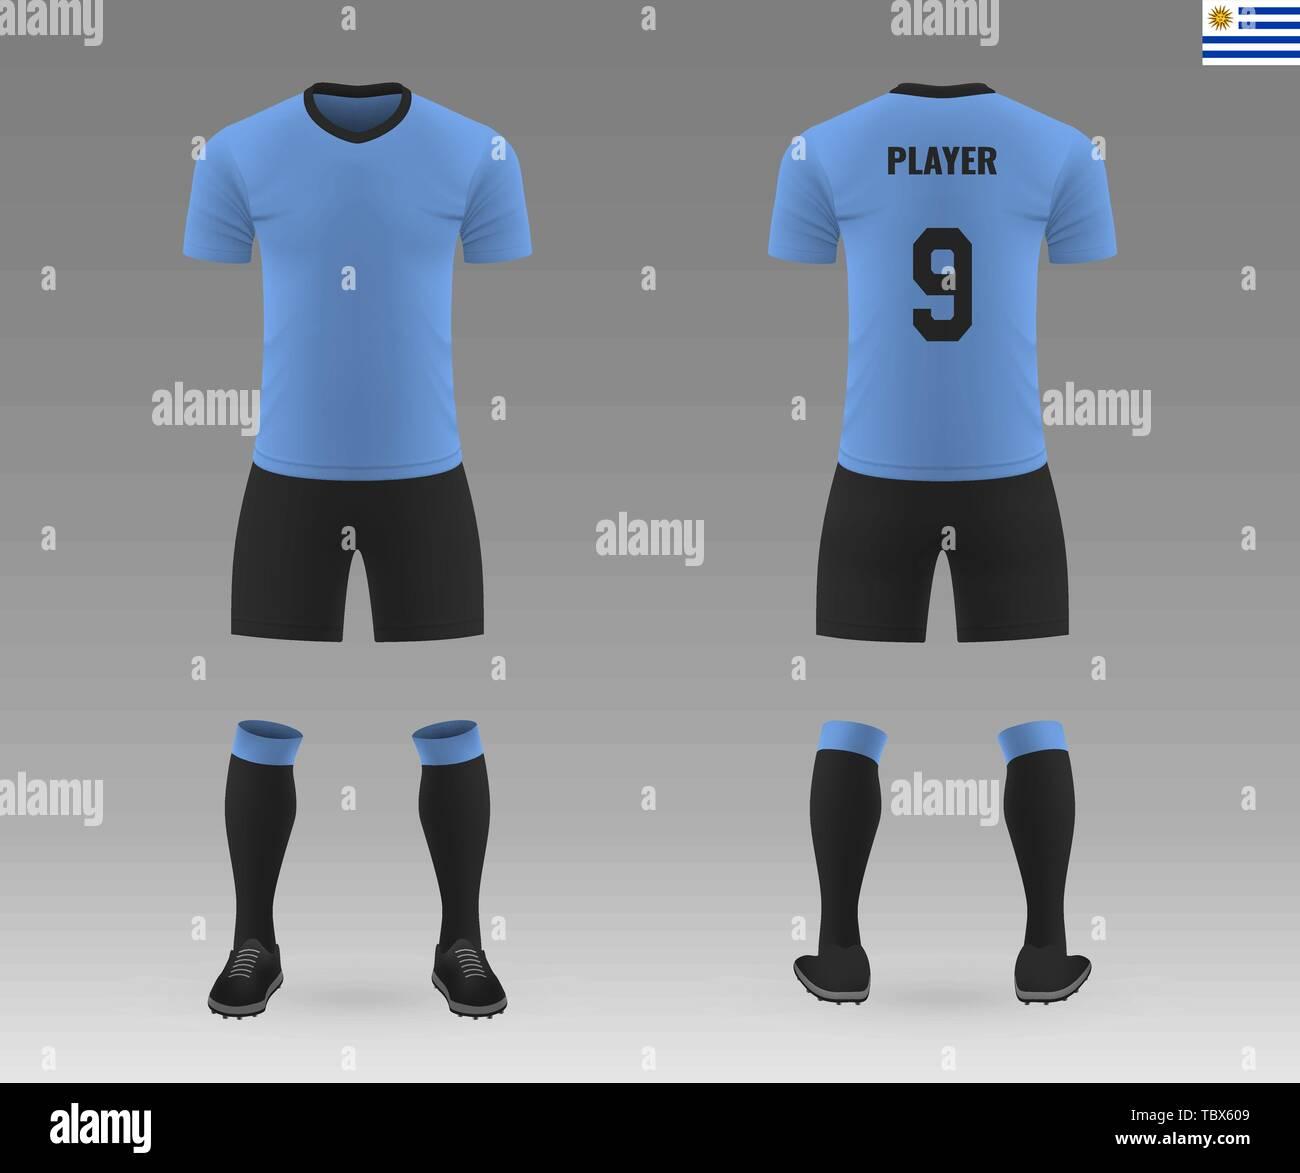 89df3957a93 football kit of national team Uruguay, shirt template for soccer jersey. Vector  illustration